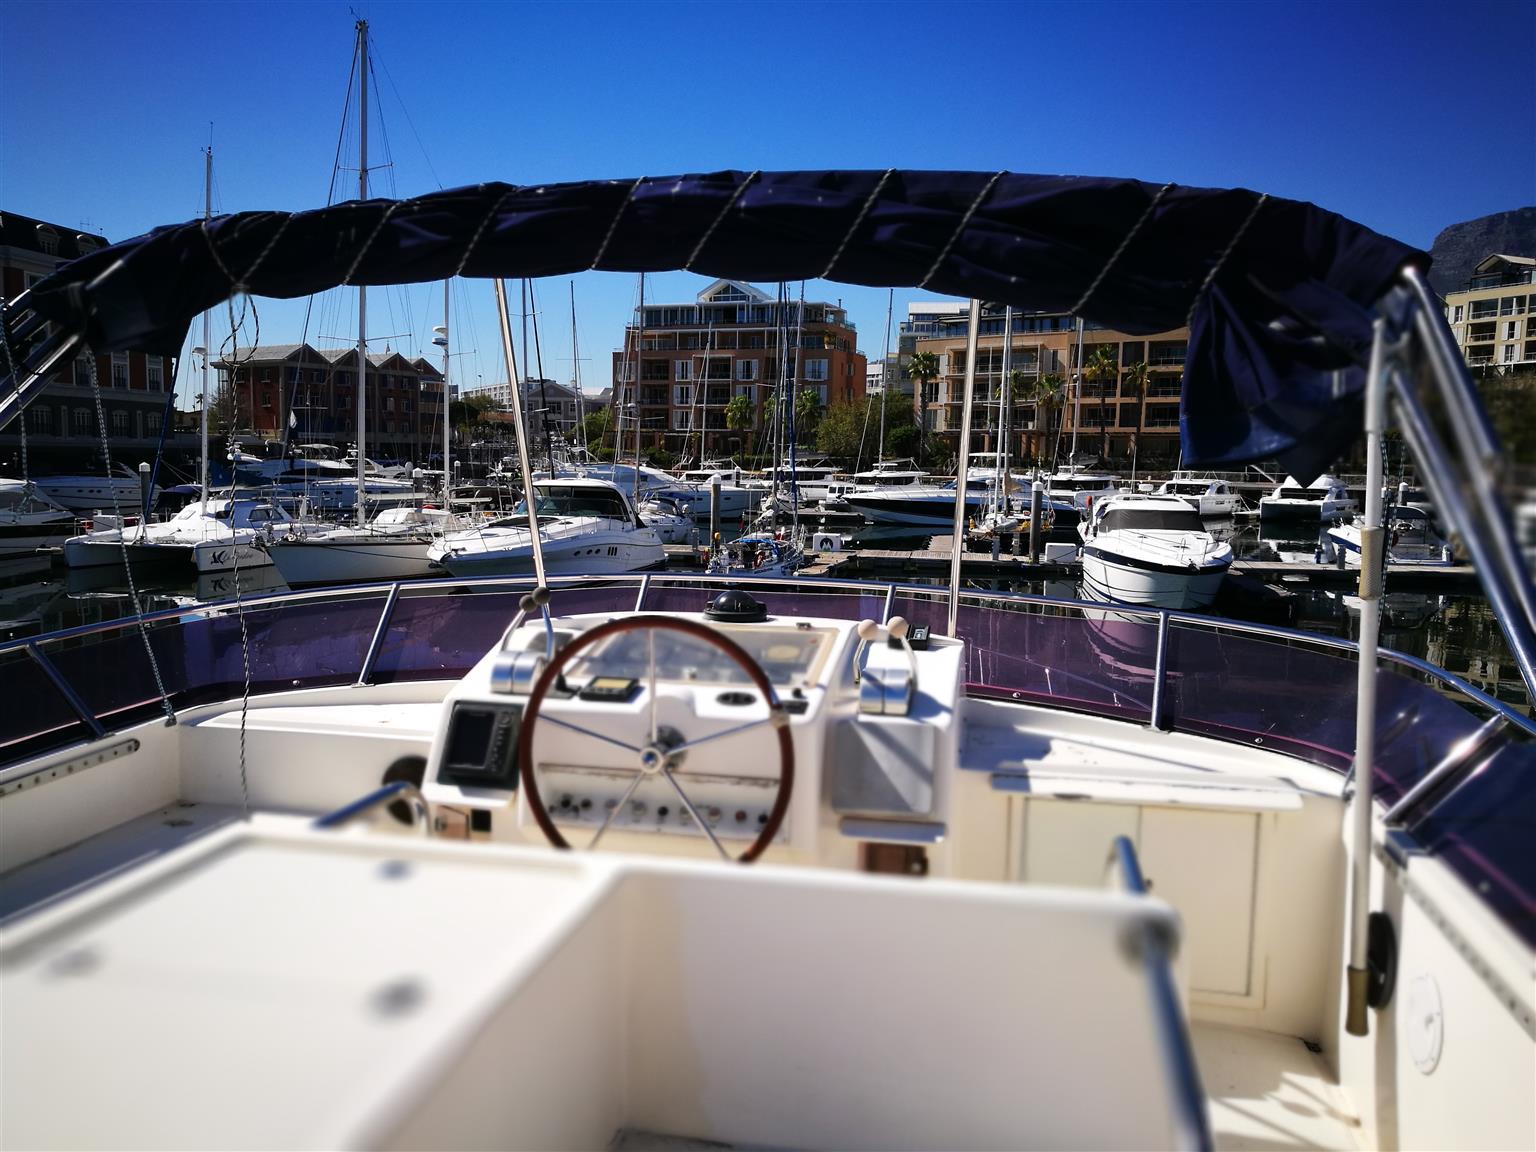 Horizon Yacht 18.8m Yacht - ON AUCTION